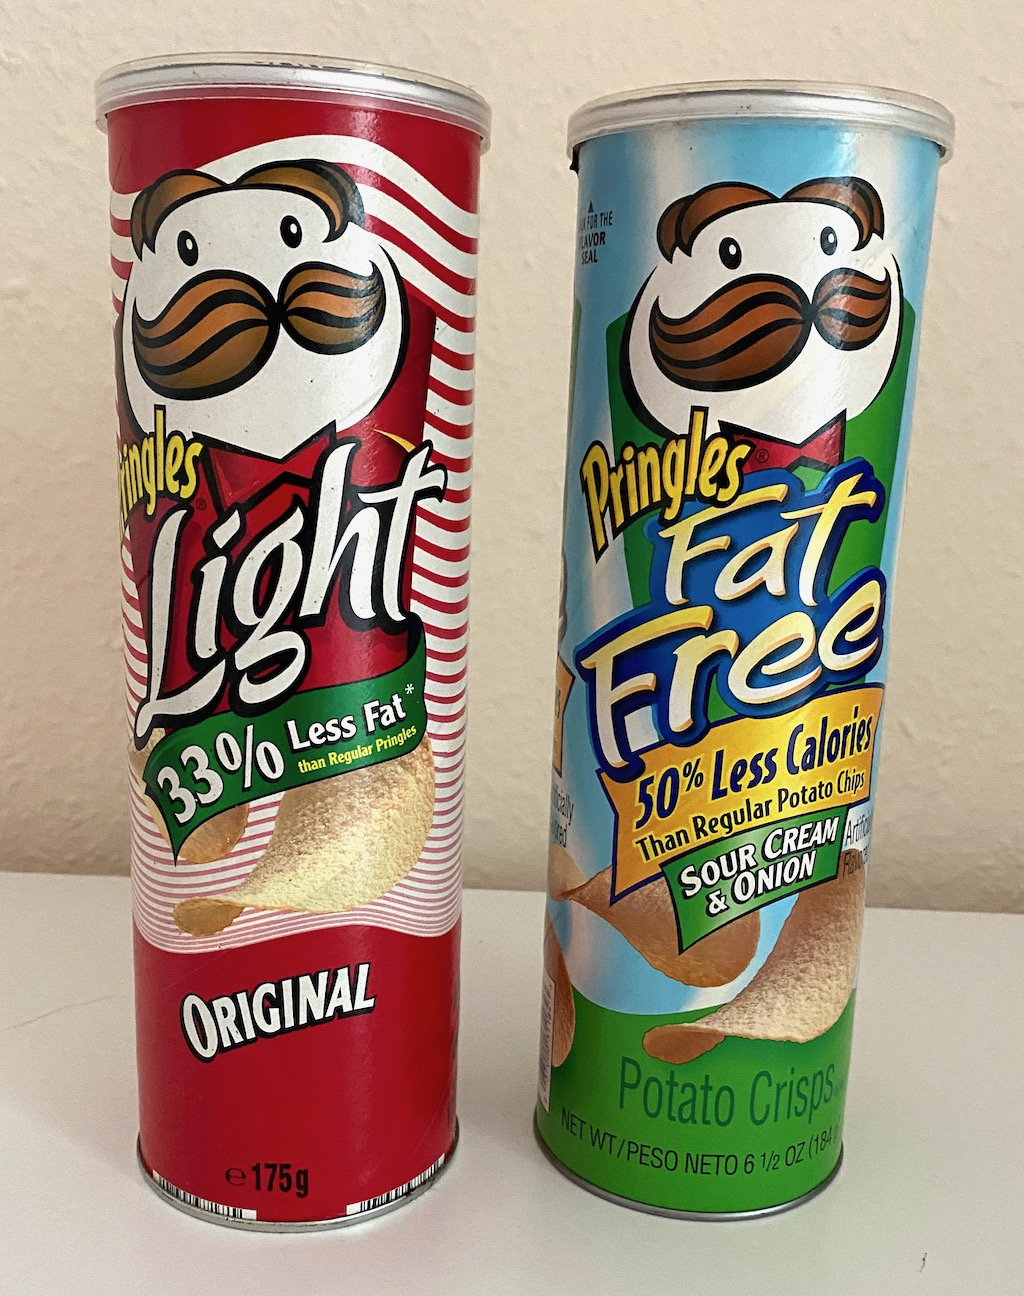 Pringles Original Light 33% Less Fat-Fat Free 50% Less Calories